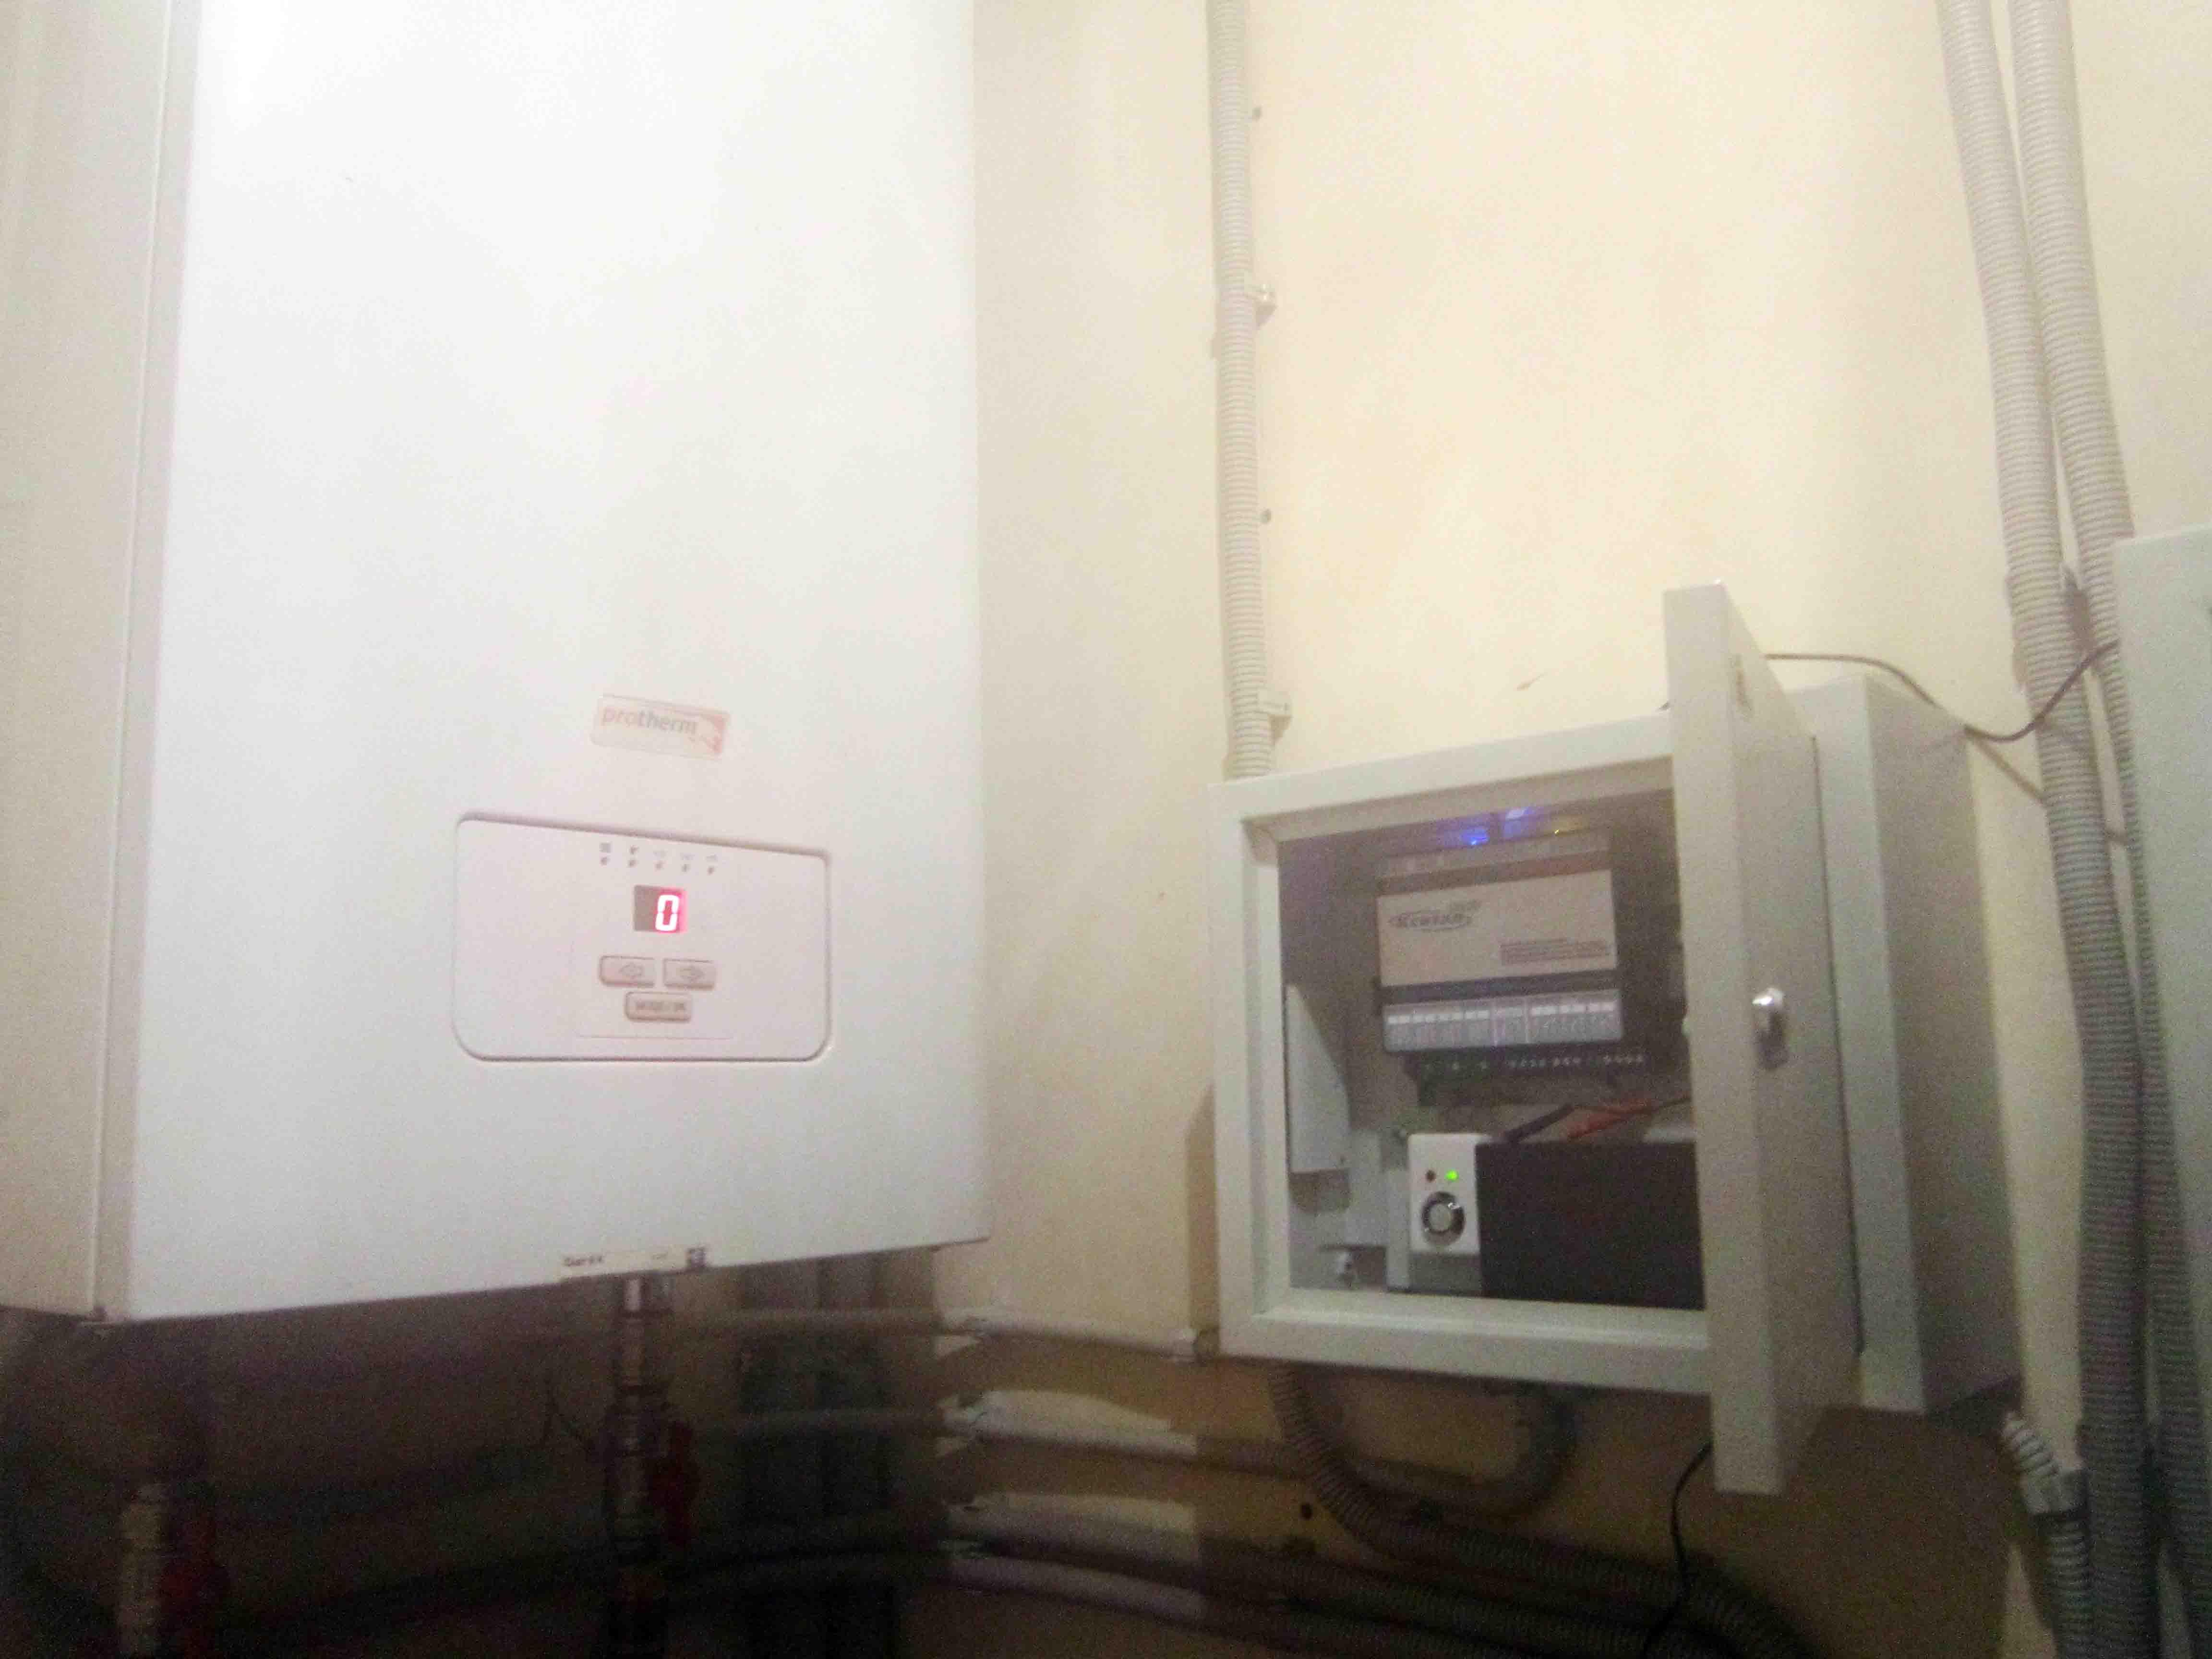 Anschluss des GSM-Moduls an die Boiler-Protherm-Rampe. Steuerung des ...